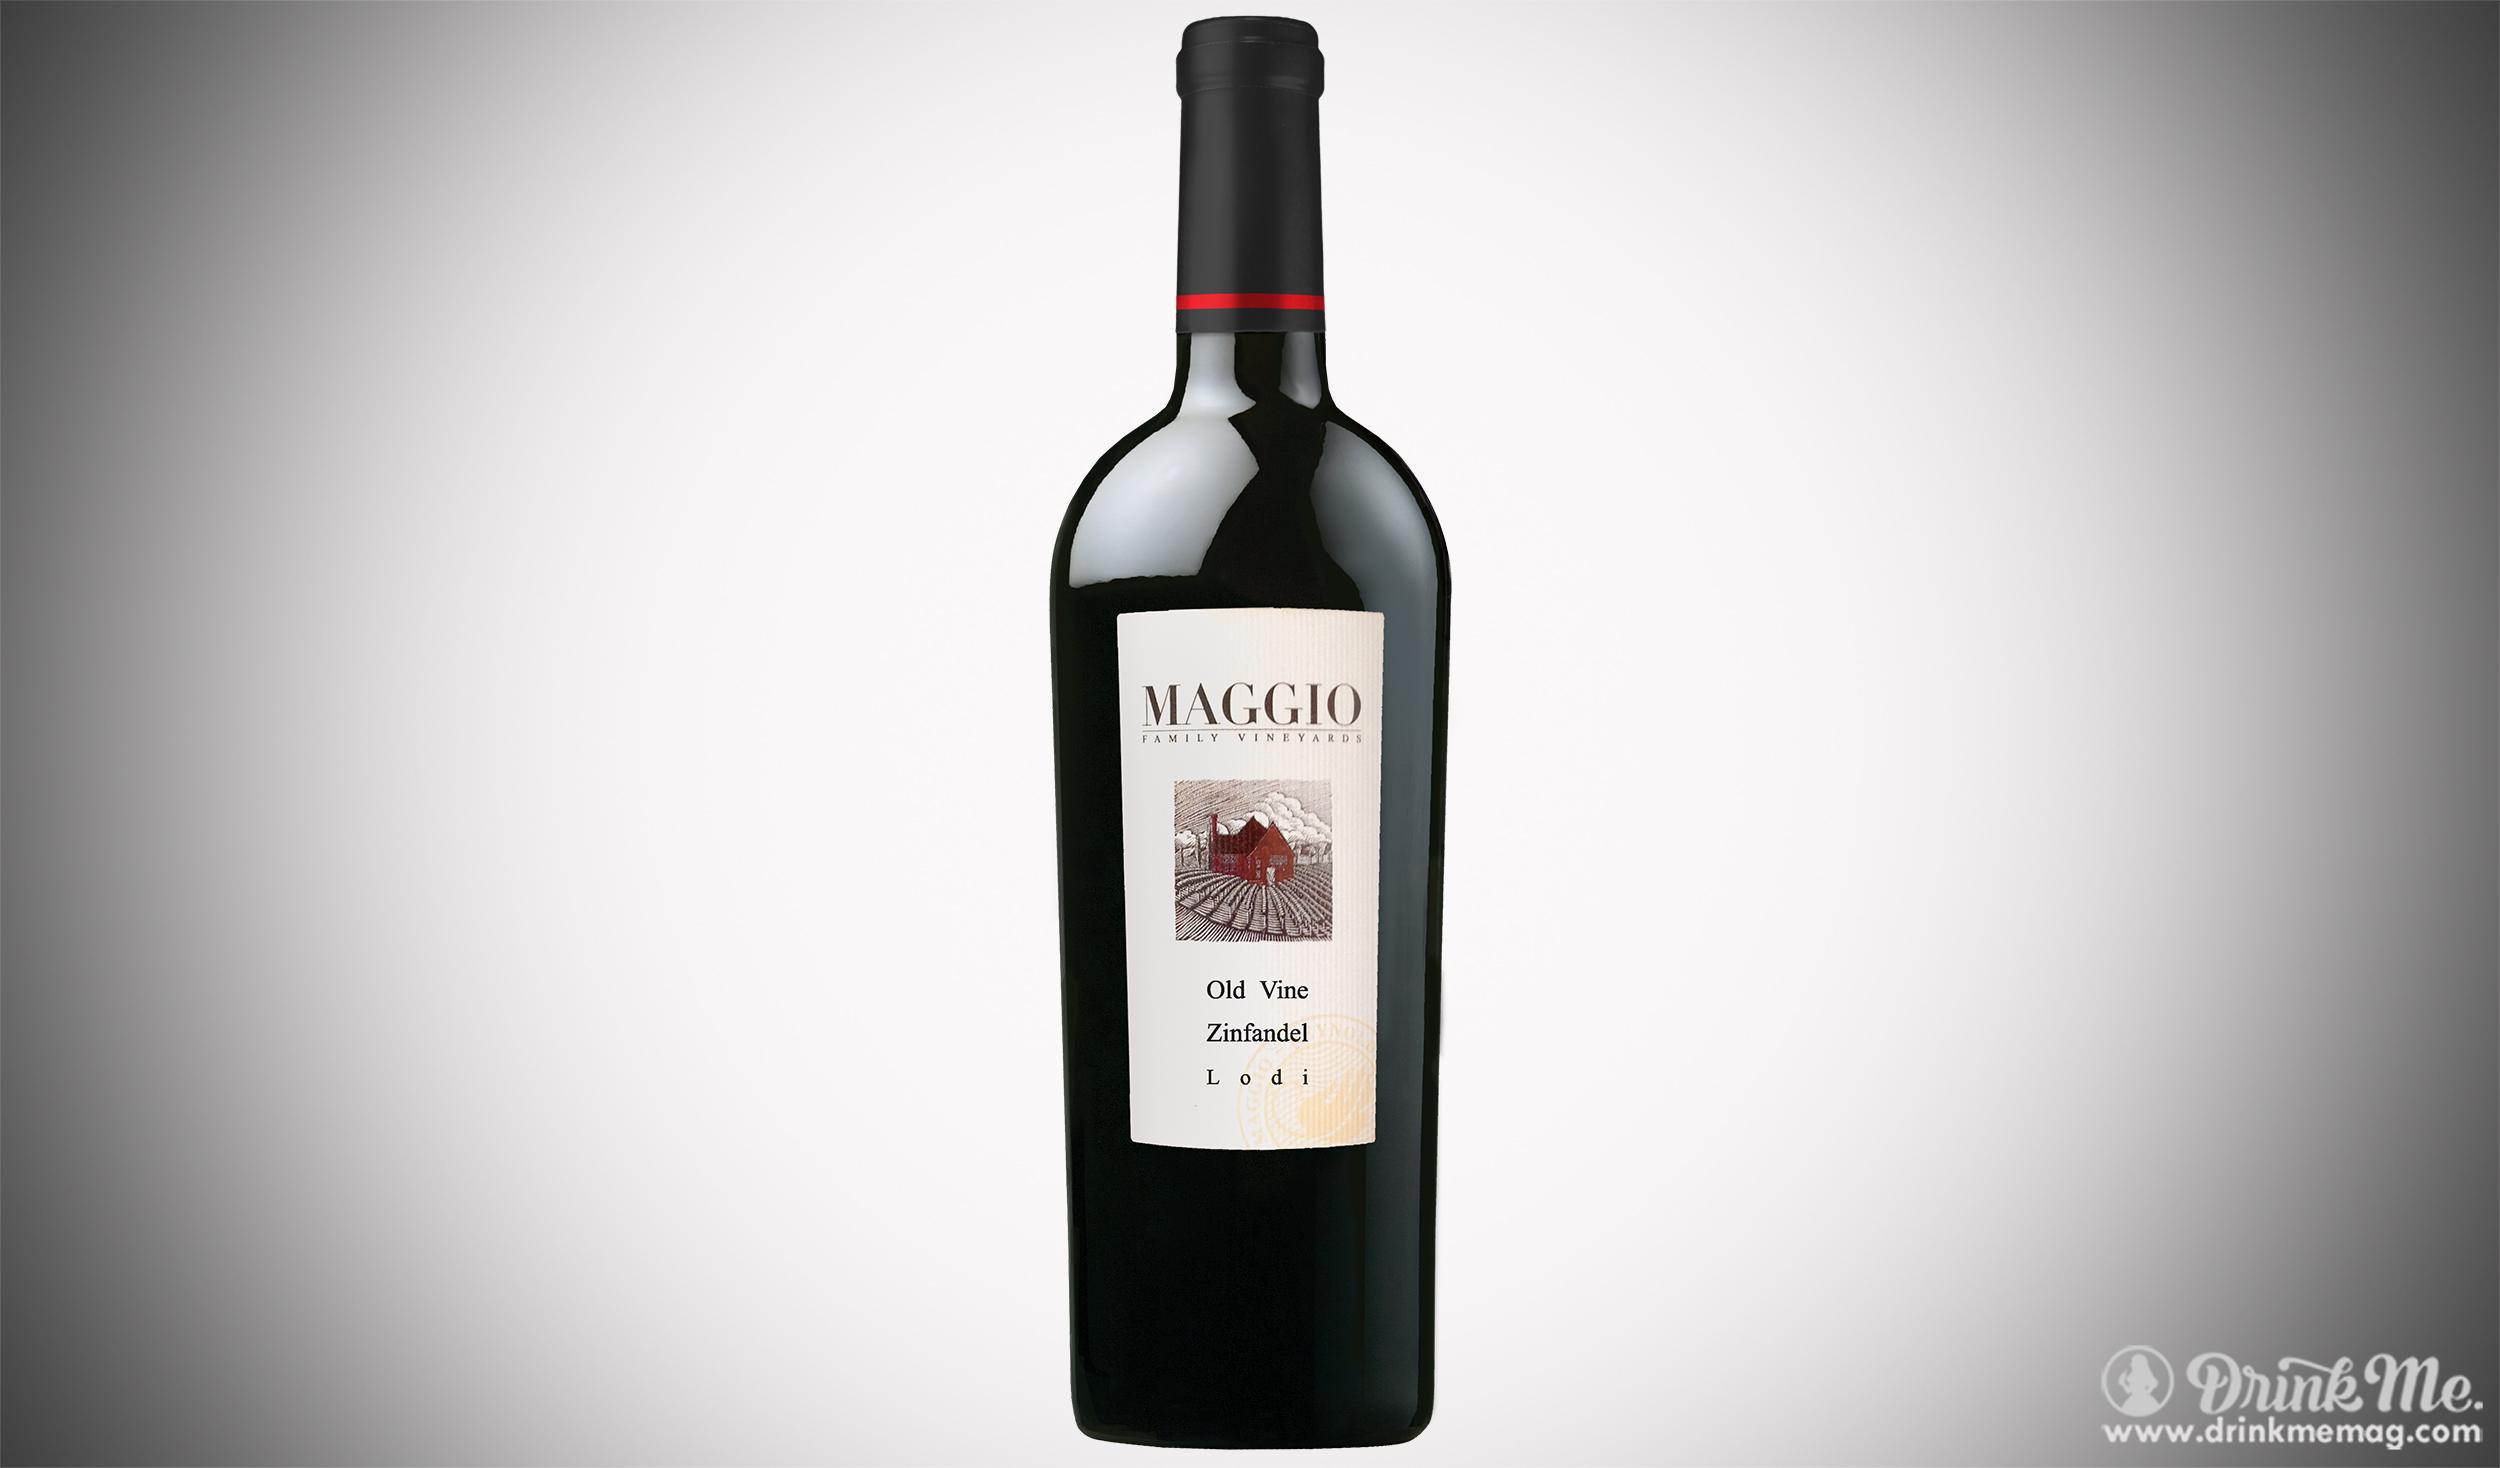 Oak Ridge Maggio Family Vineyards Old Vine Zinfandel 2012 drinkmemag.com  drink mea